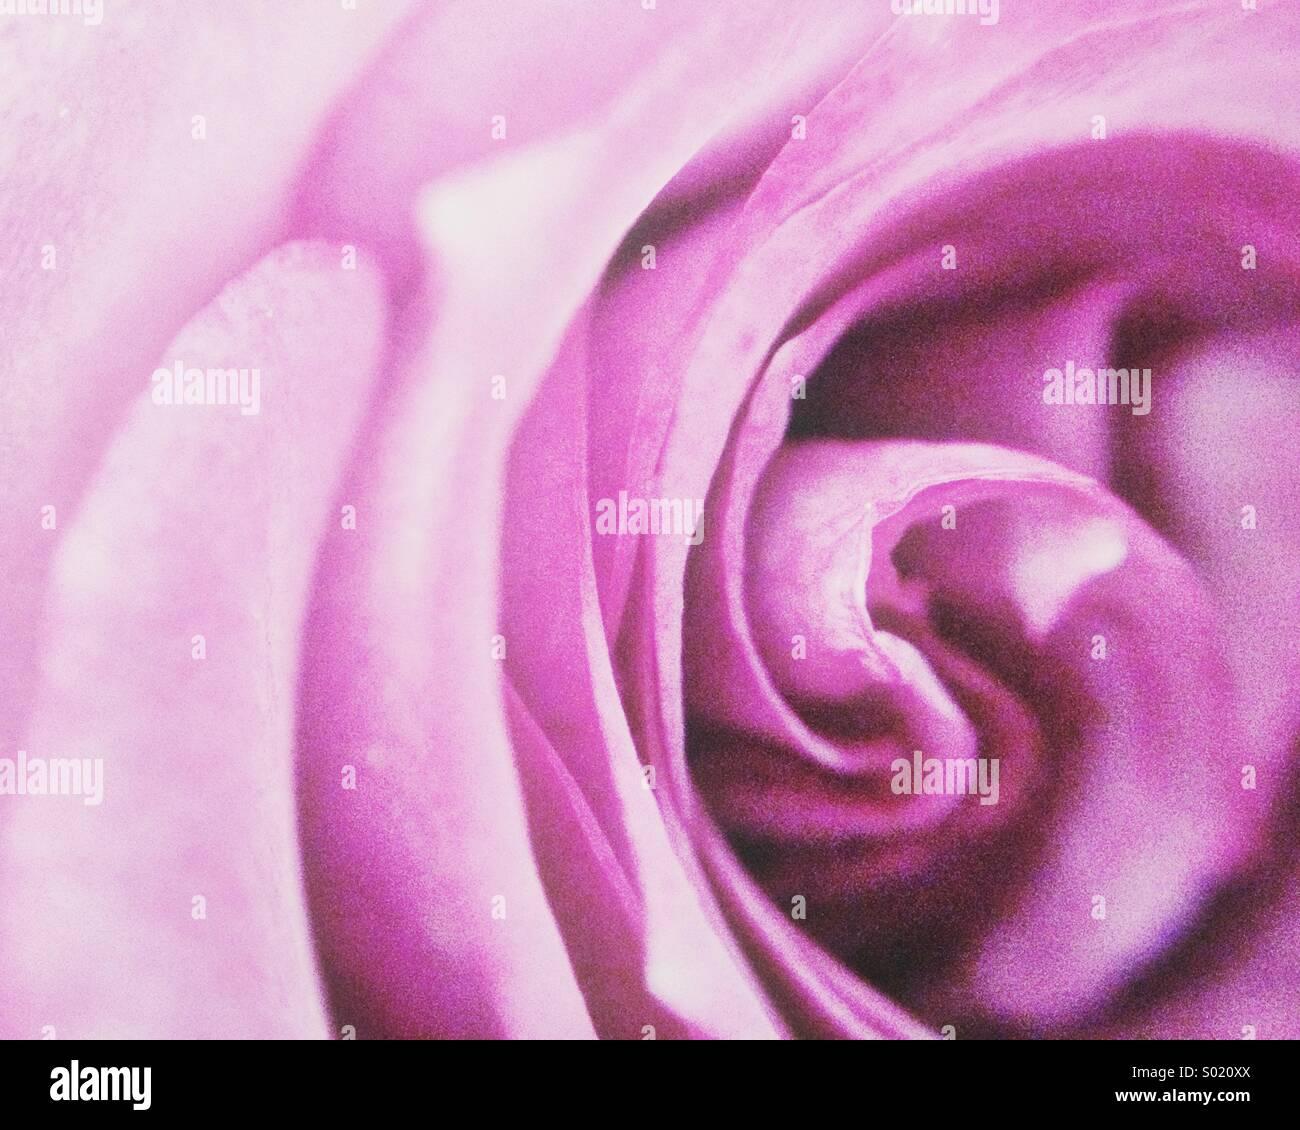 Rosa púrpura Imagen De Stock